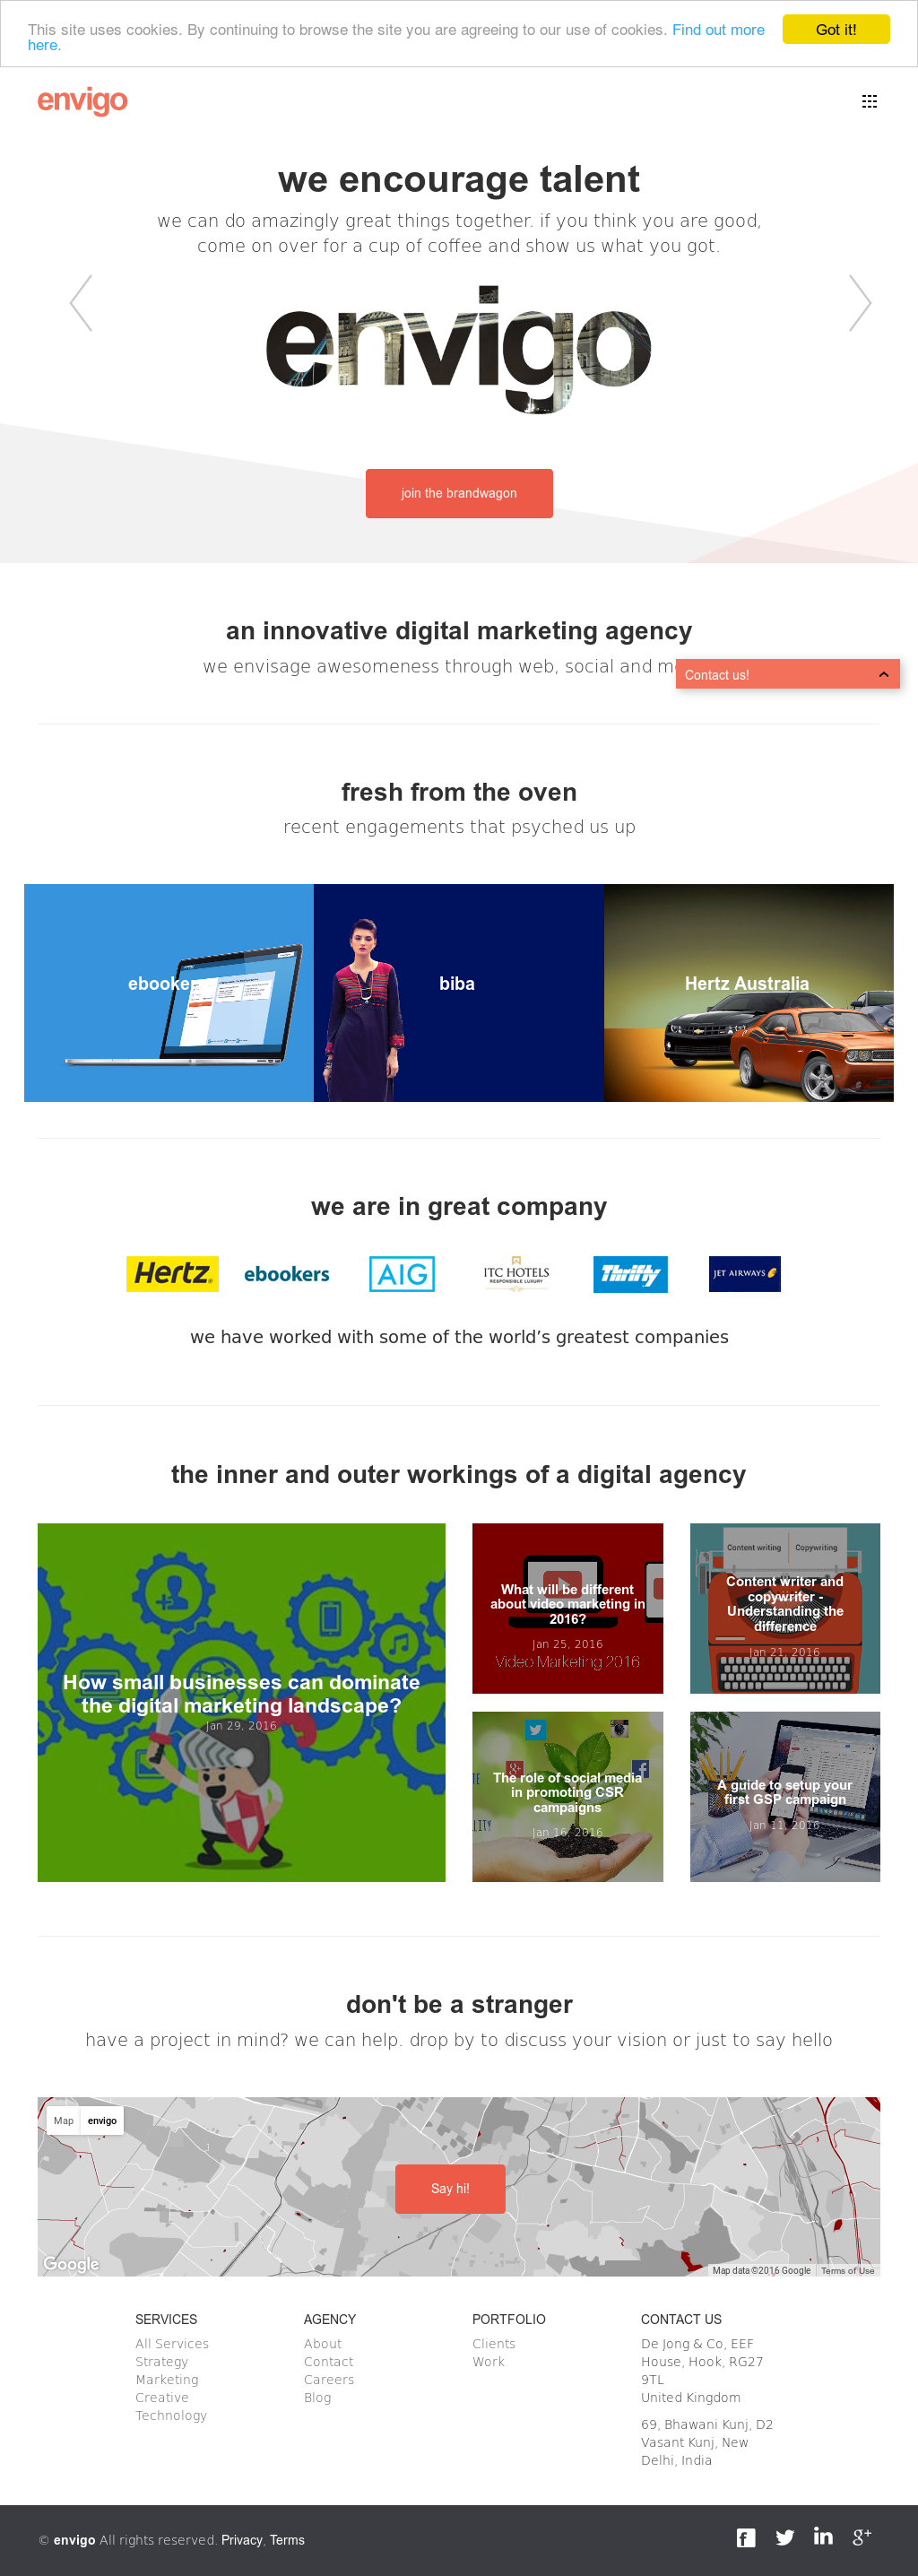 Envigo Competitors, Revenue and Employees - Owler Company Profile